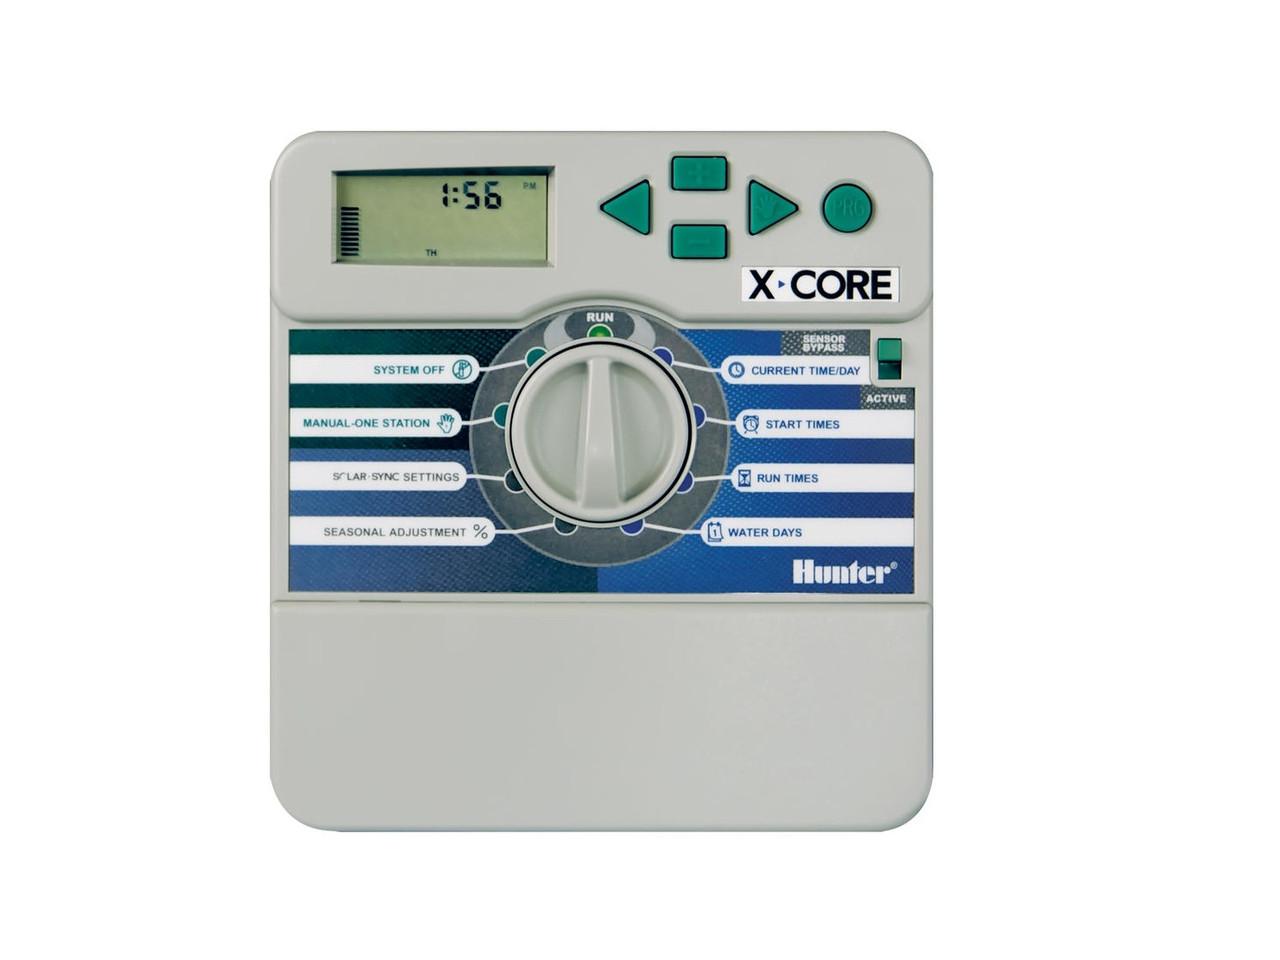 Контроллер  X-CORE XC-801i-E на 8 зон для внутренней установки с трансформатором  П